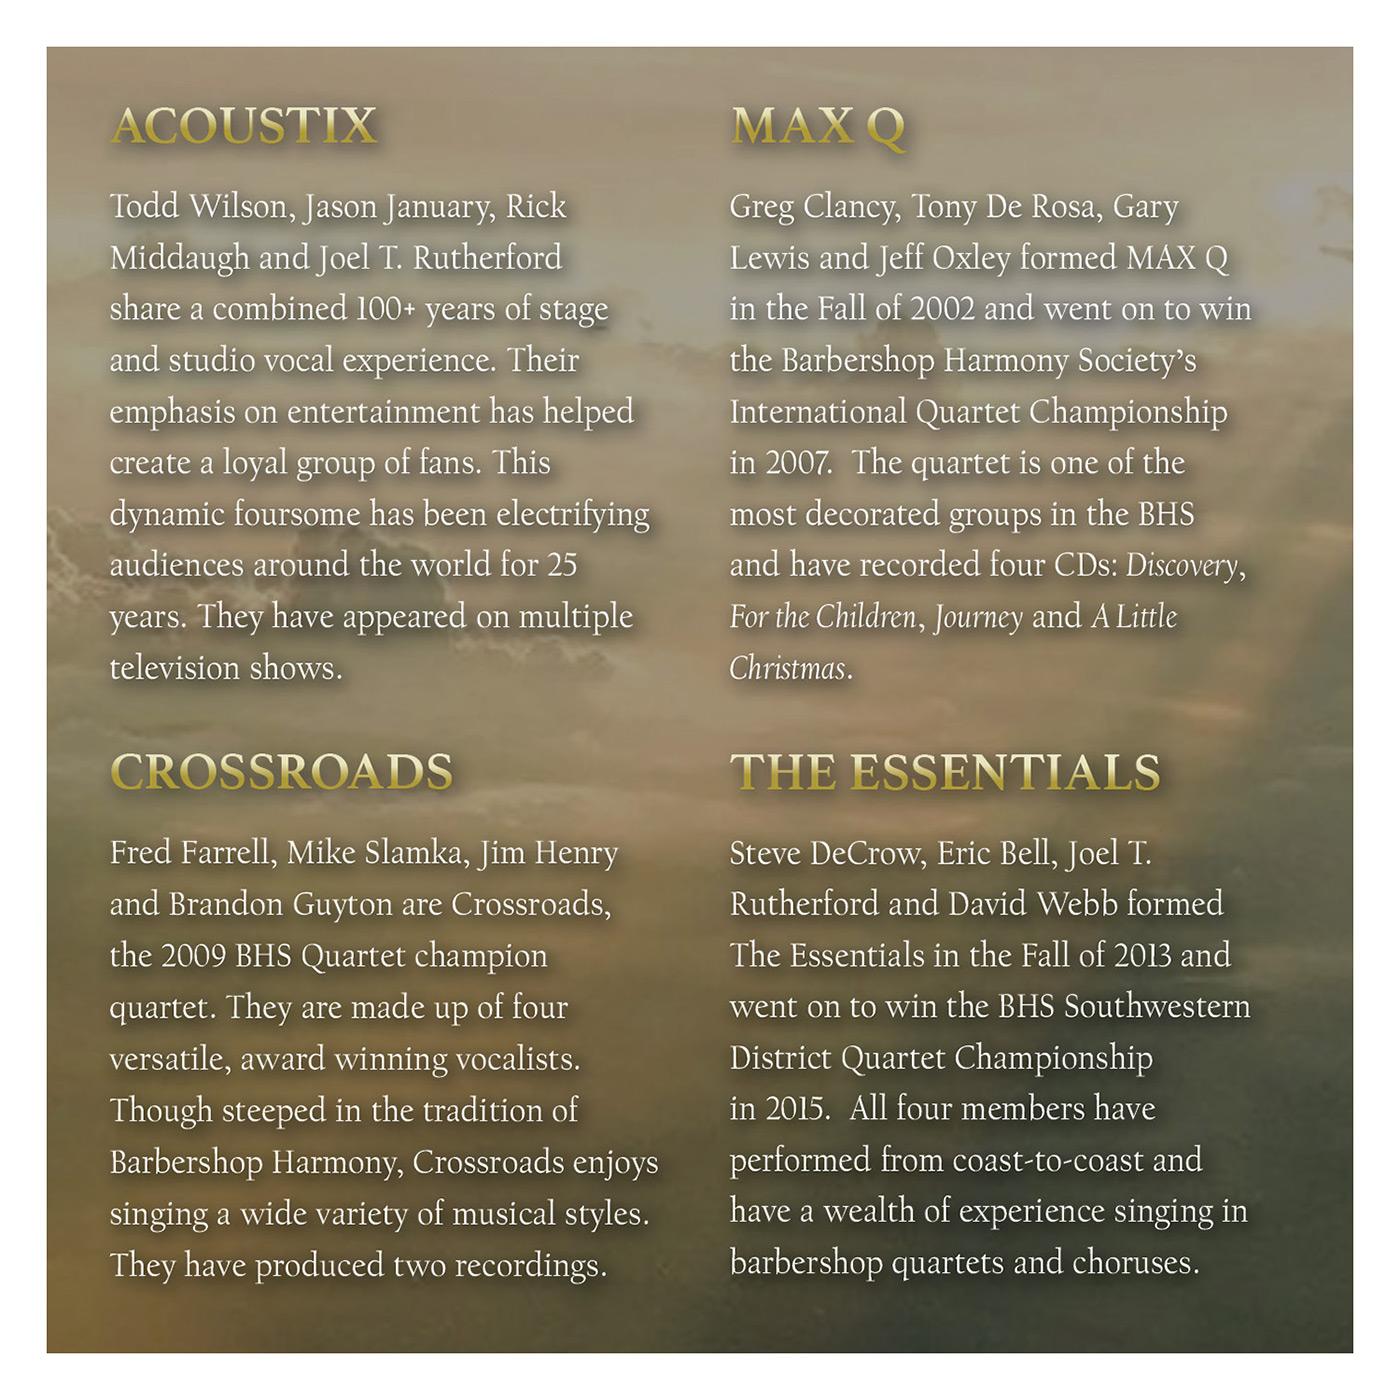 Booklet Inside Panel 4 of 4: Then Sings My Soul